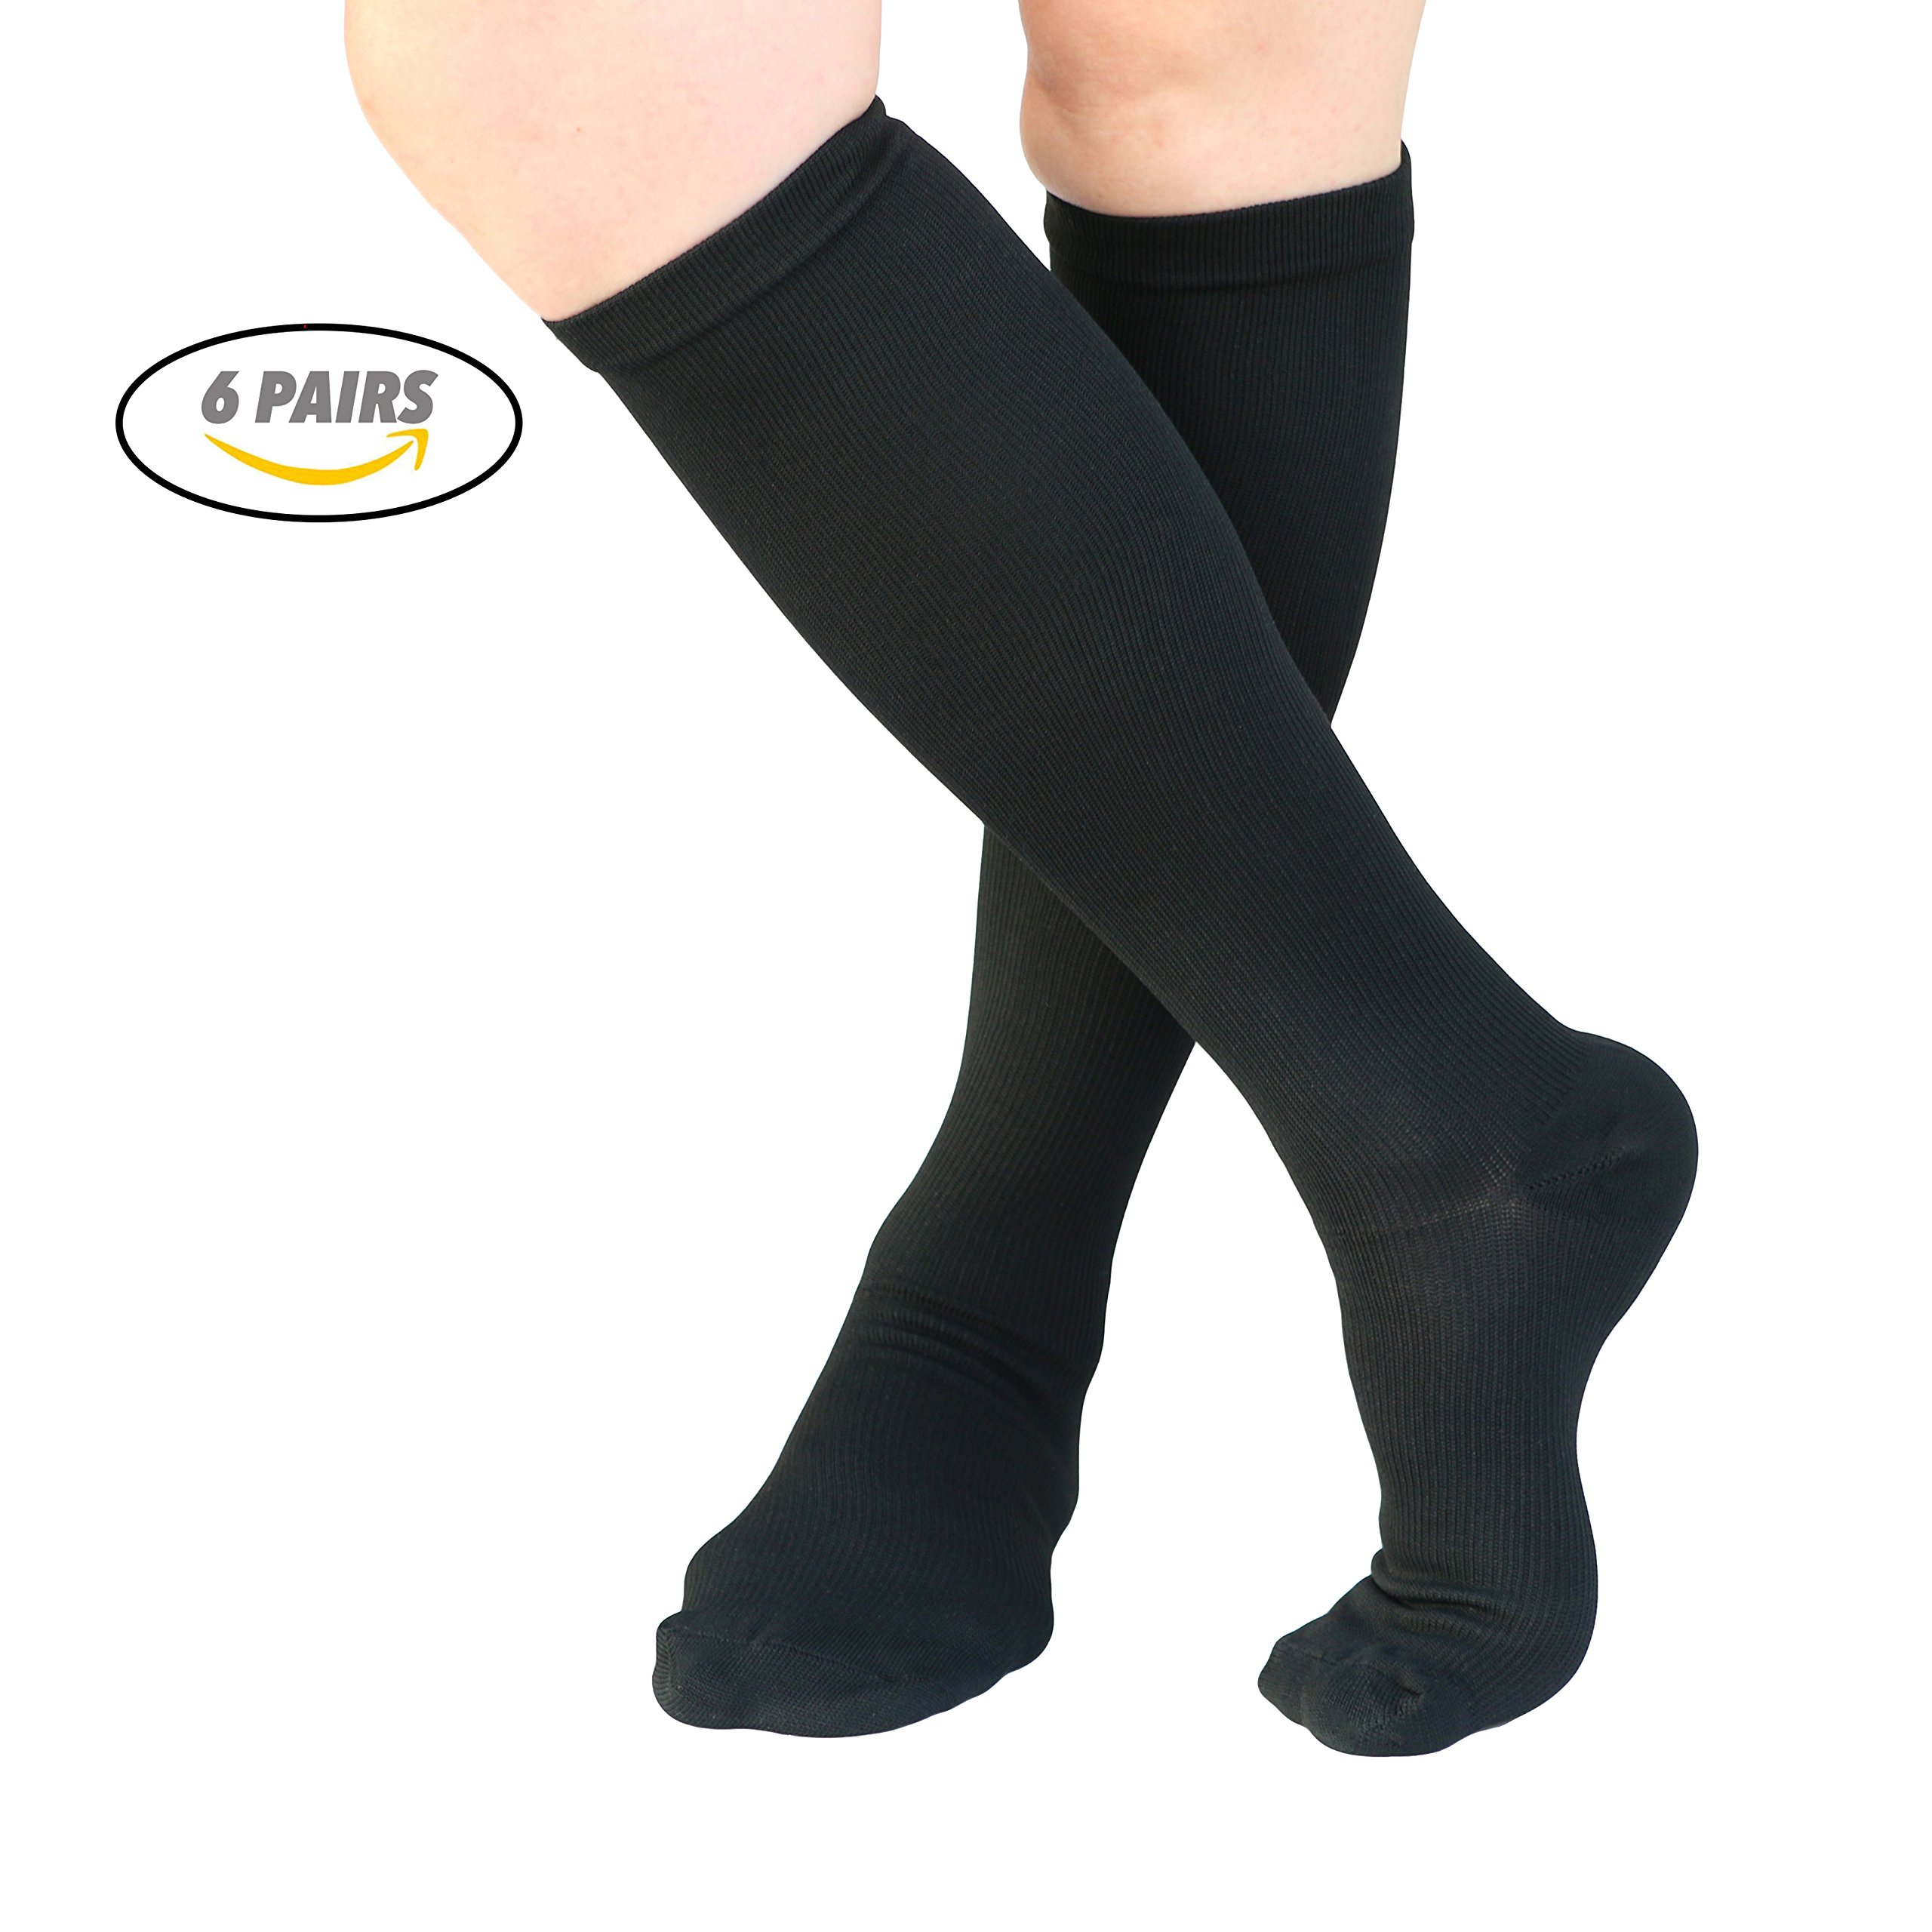 VAGUE SWEET 6 Packs Men,Women Black Knee High Graduate Moisture Wicking Compression Socks,Best Medical, Nursing, Travel & Flight,Circulation & Recovery,Running & Fitness,15-20 mmHg(S/M,Black)